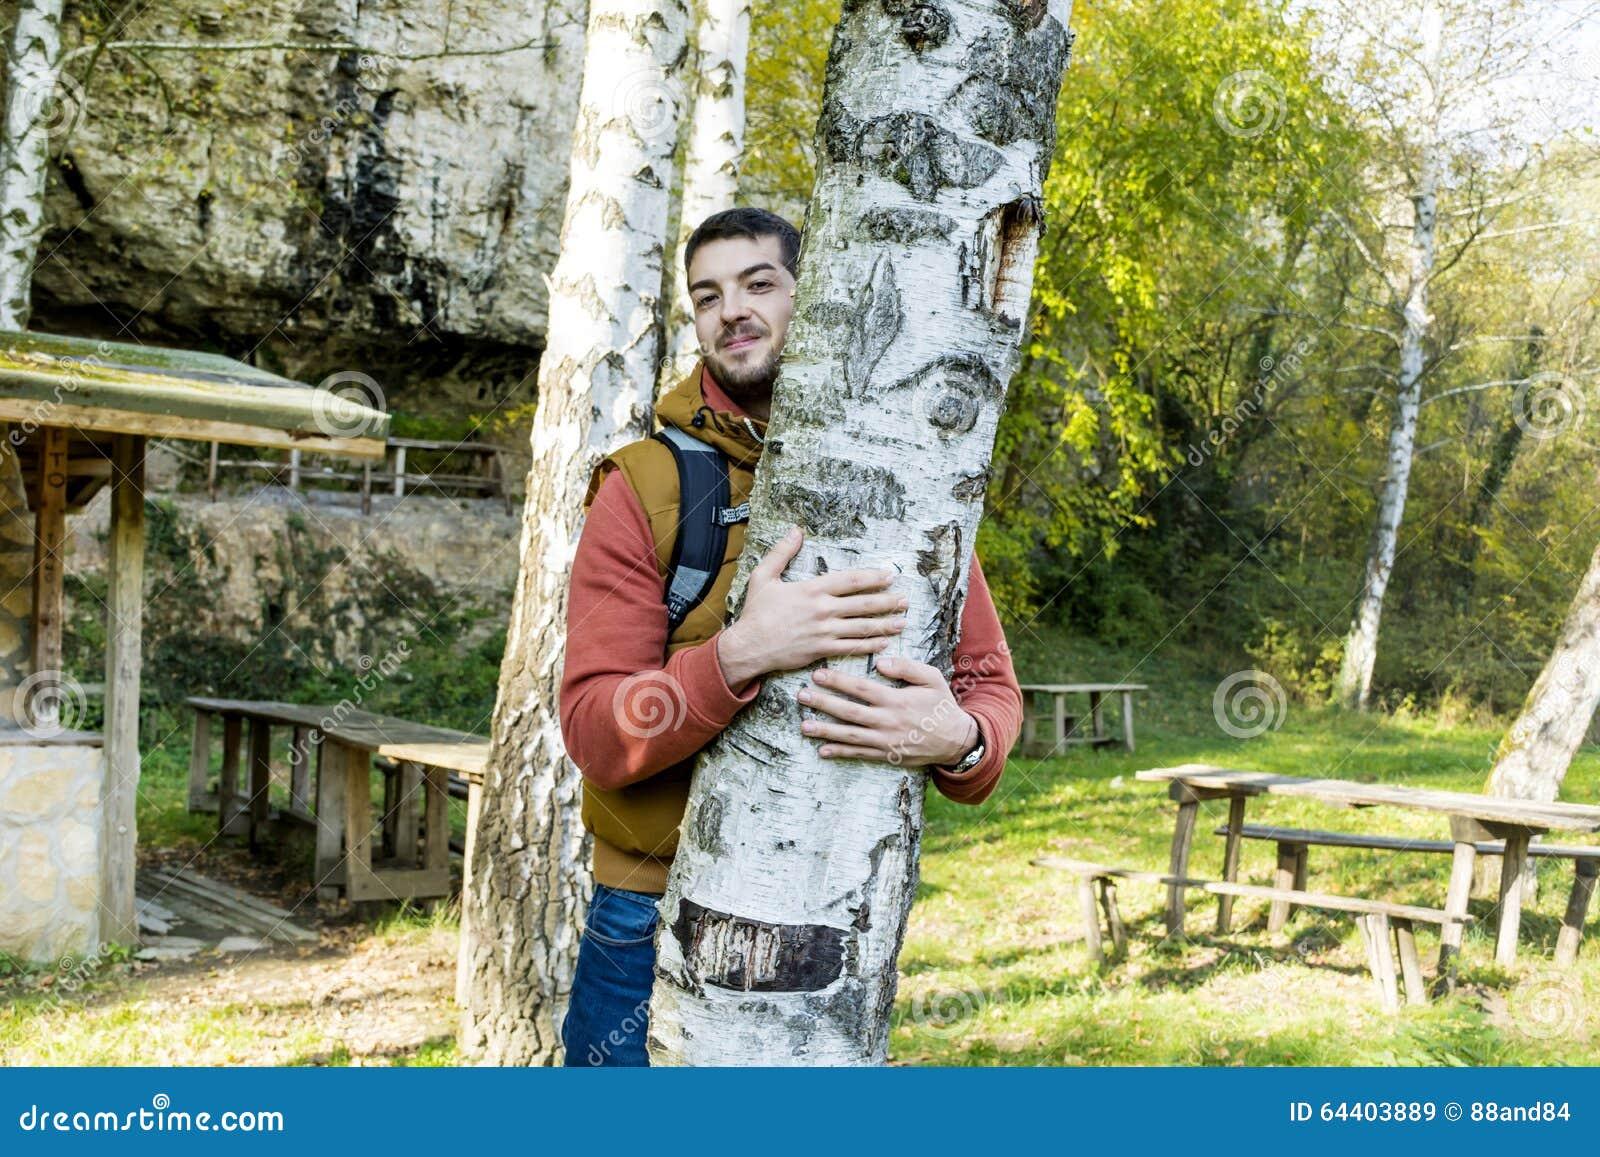 Arbre Hugger Nature affectueuse